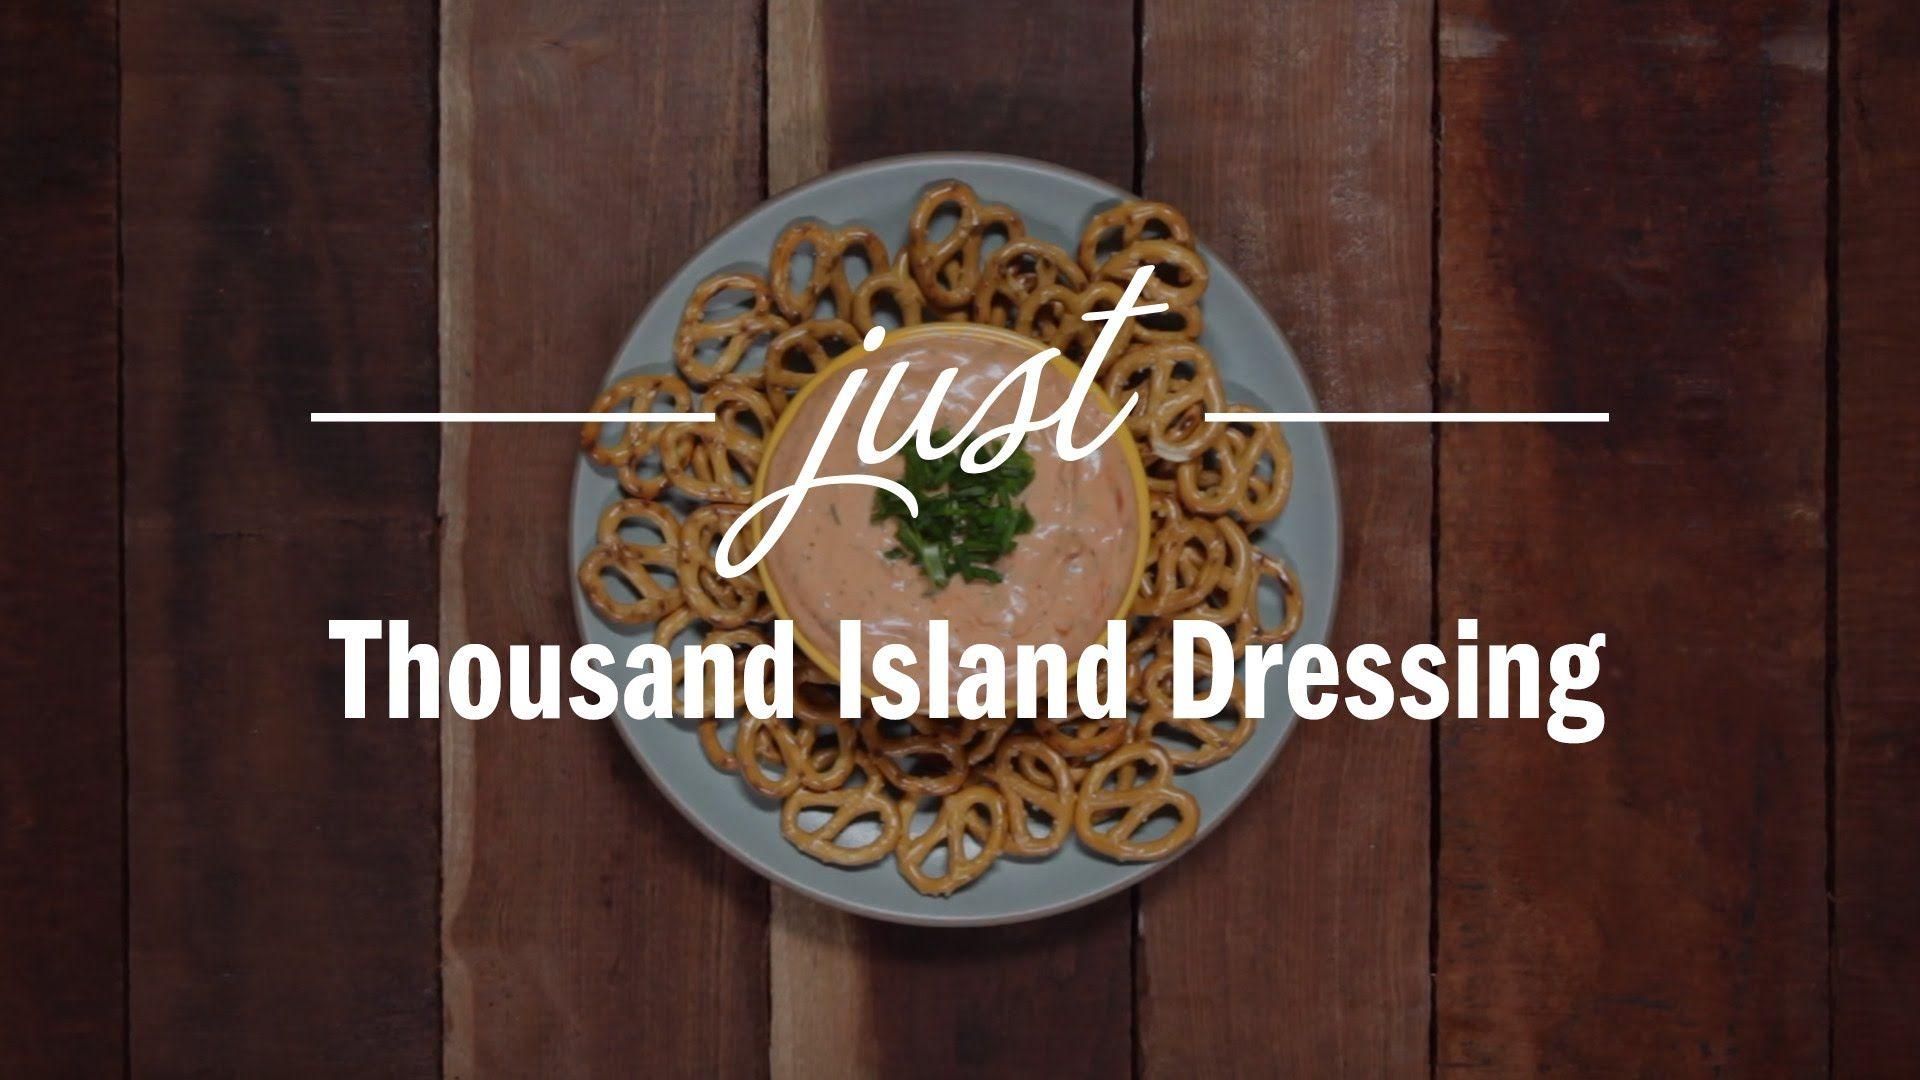 Homemade Thousand Island Dressing - Just Recipes